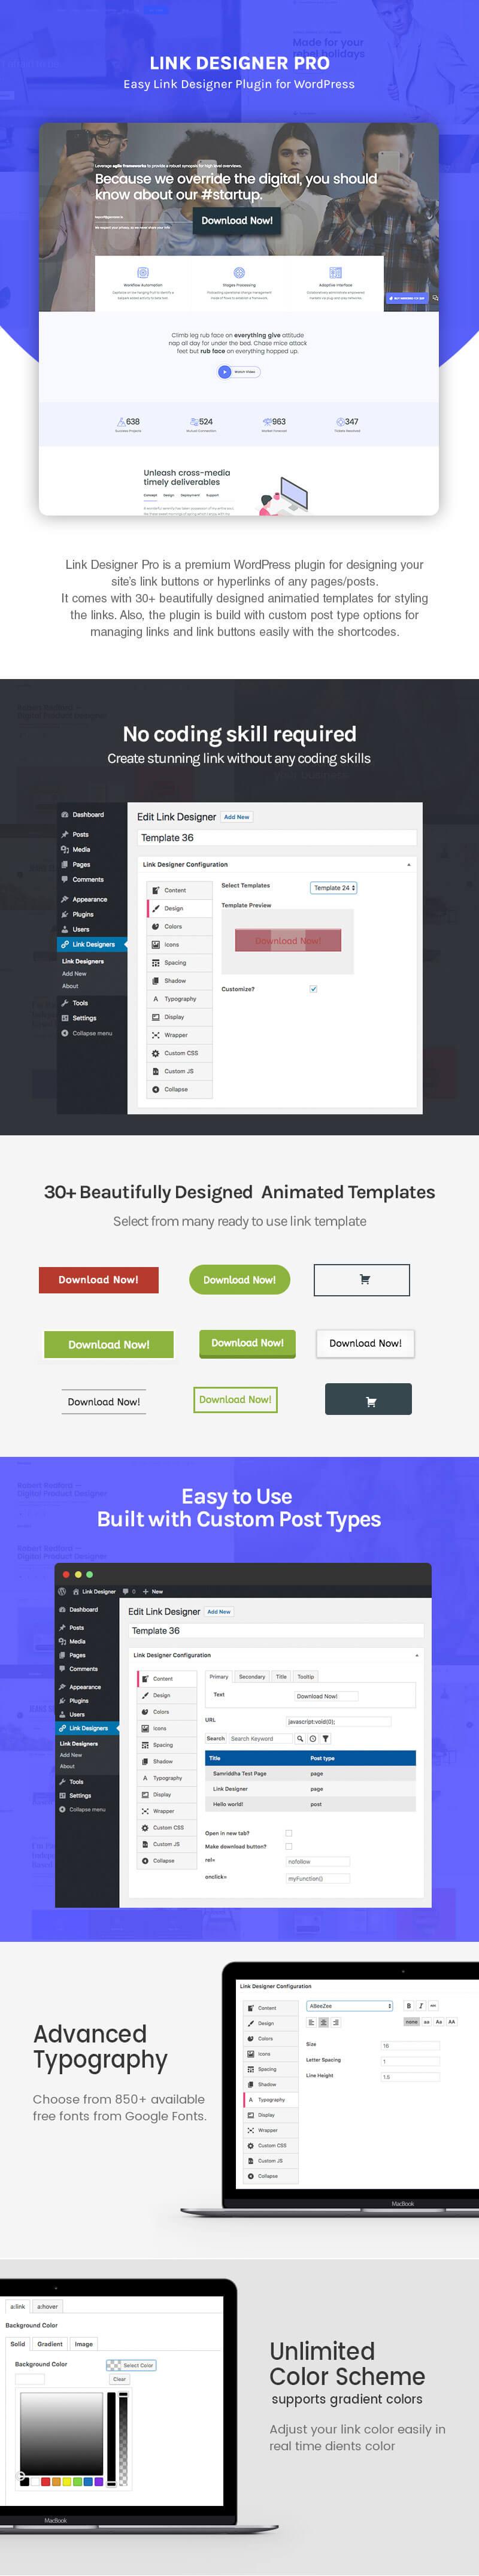 Link Designer – Premium Link Designer Plugin for WordPress